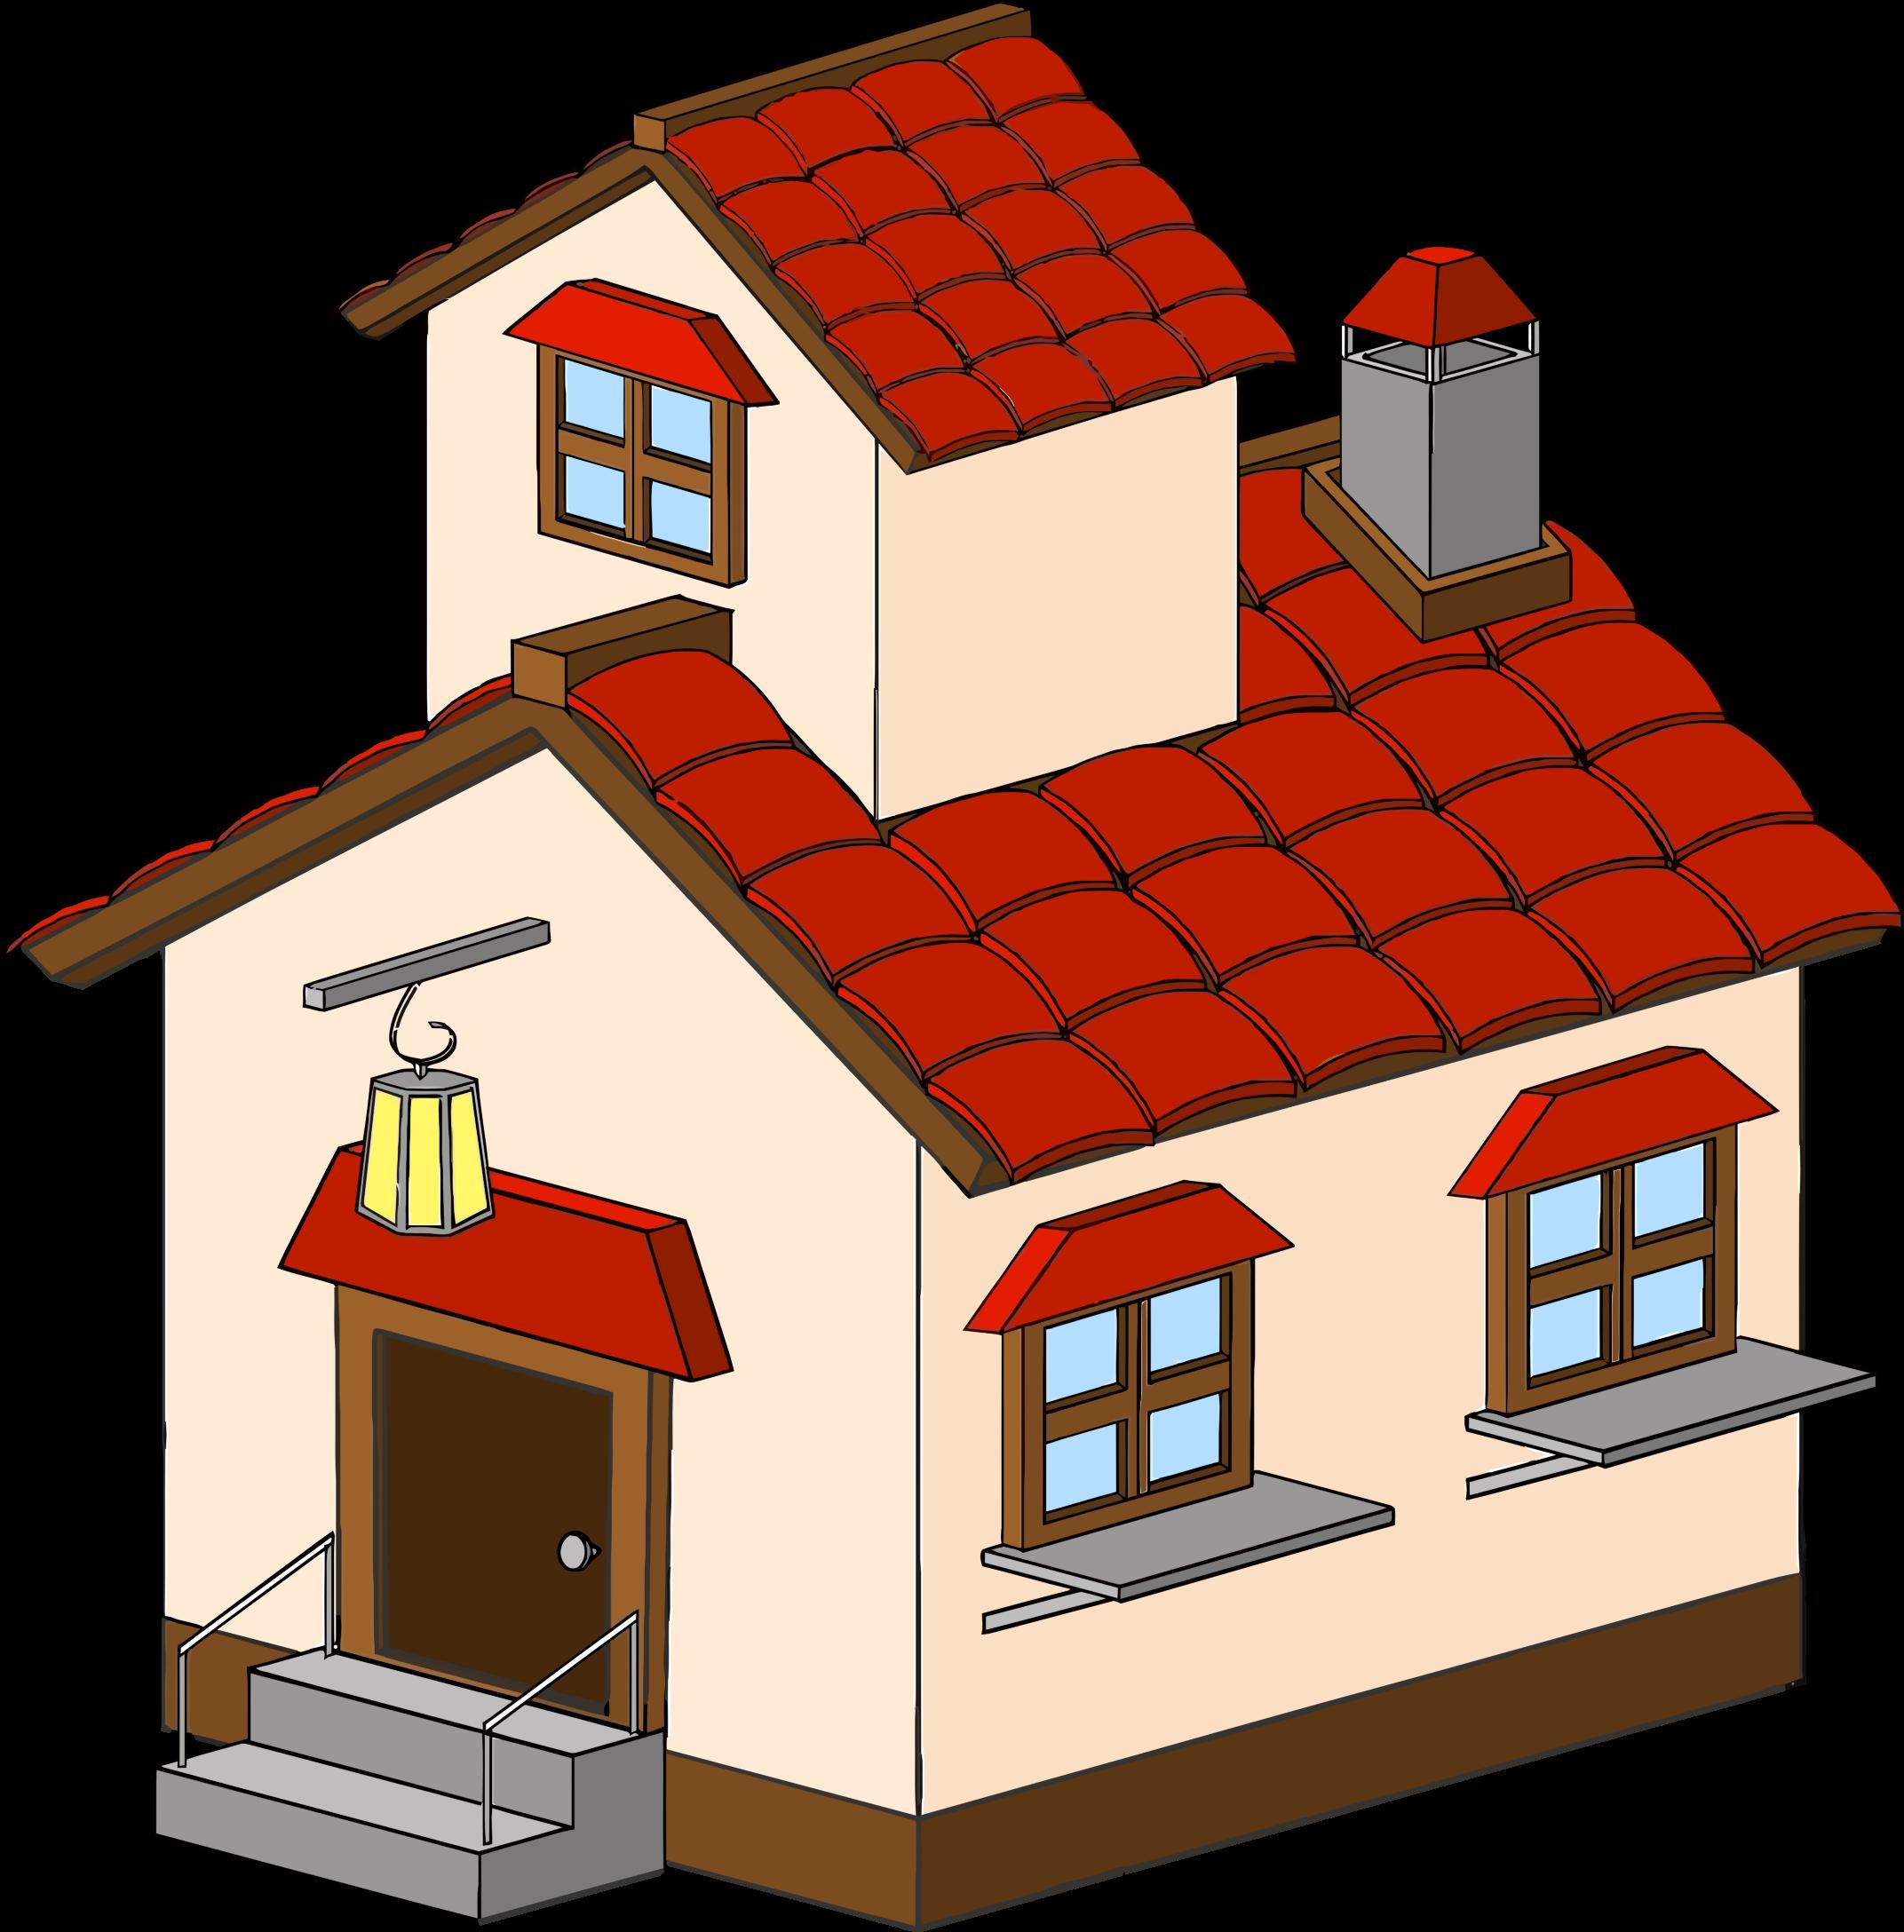 2144x2176 House Clip Art